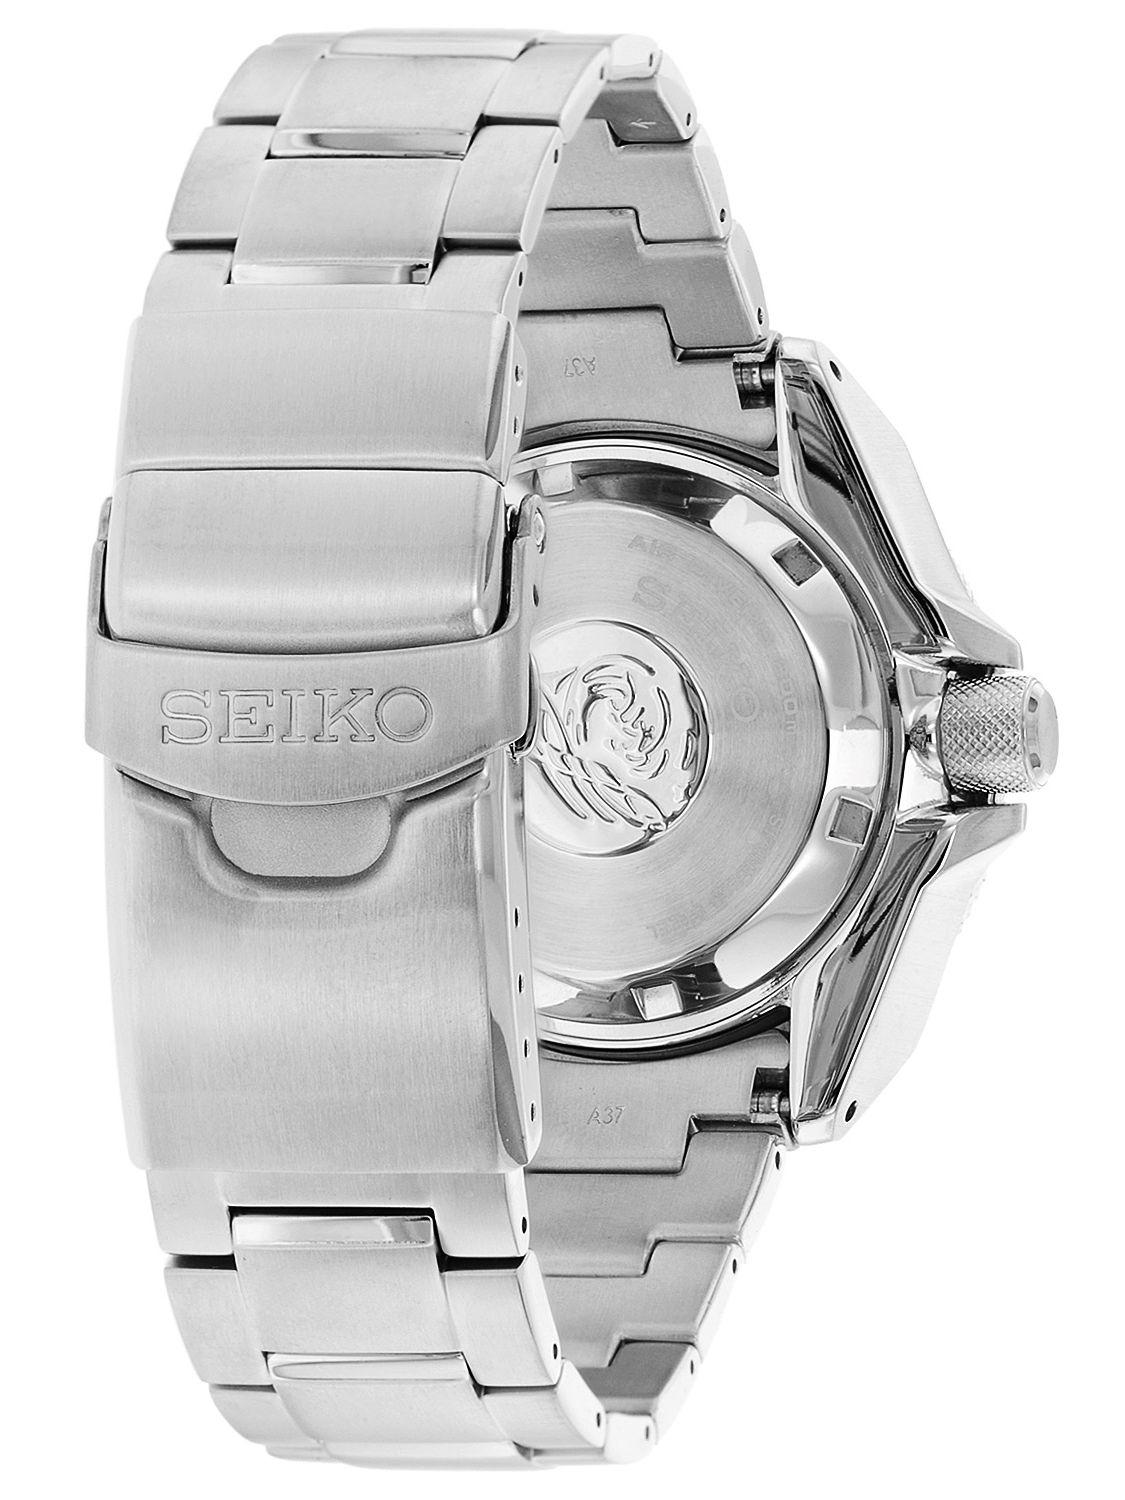 ... Seiko SRPB51K1 Prospex Diver Automatic Mens Watch Samurai Image 3 ... f9152360ab